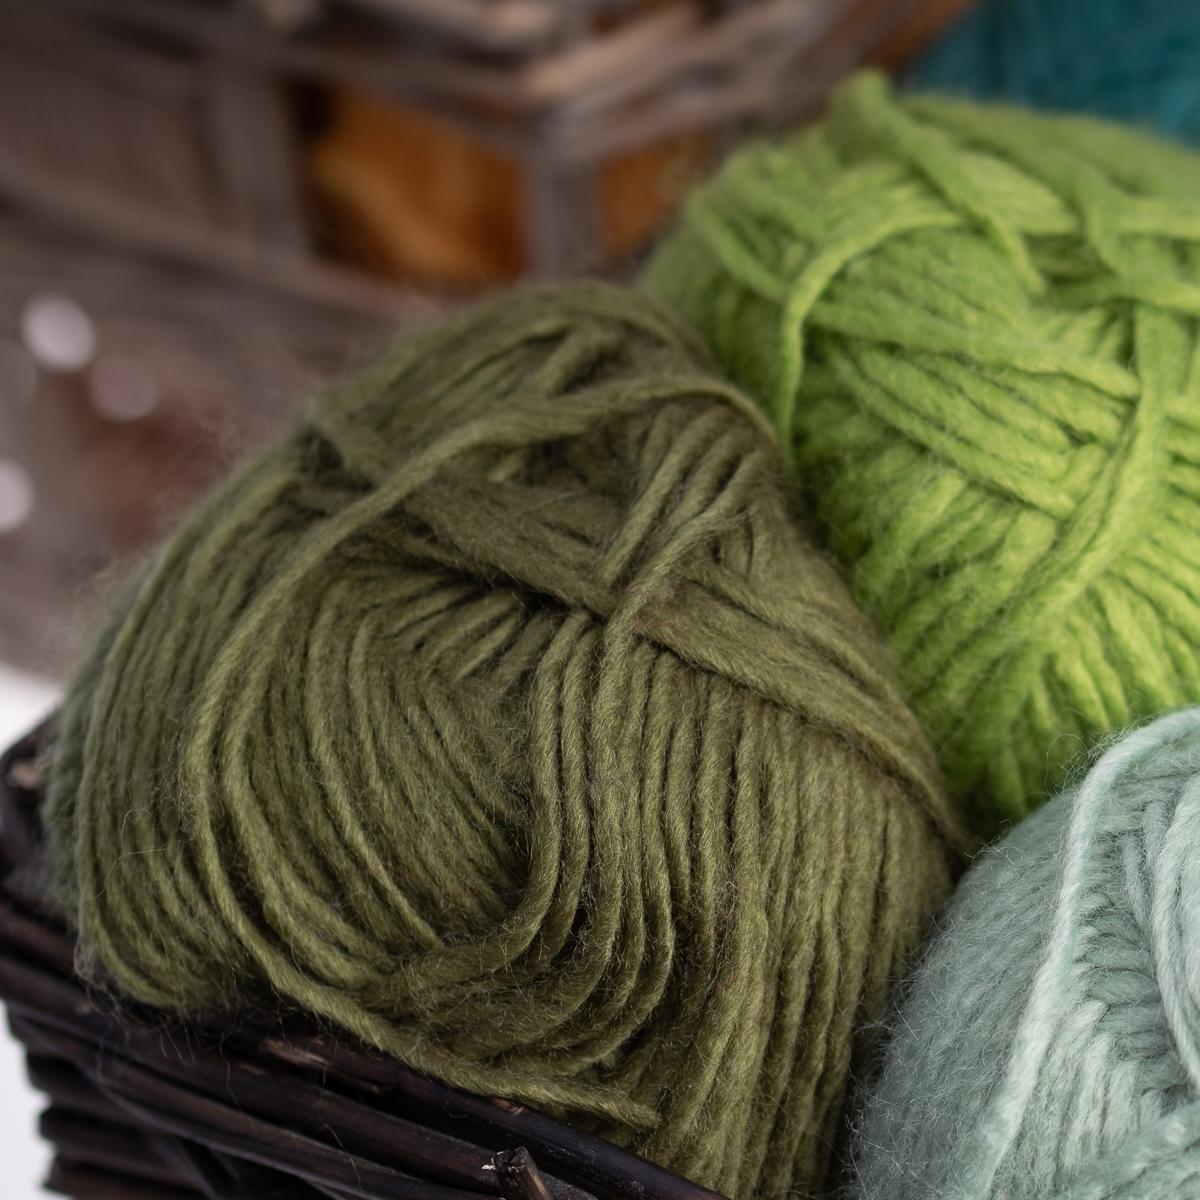 3pk-Lion-Brand-New-Basic-Acrylic-amp-Wool-Yarn-Medium-4-Knit-Crochet-Skeins-Soft thumbnail 66